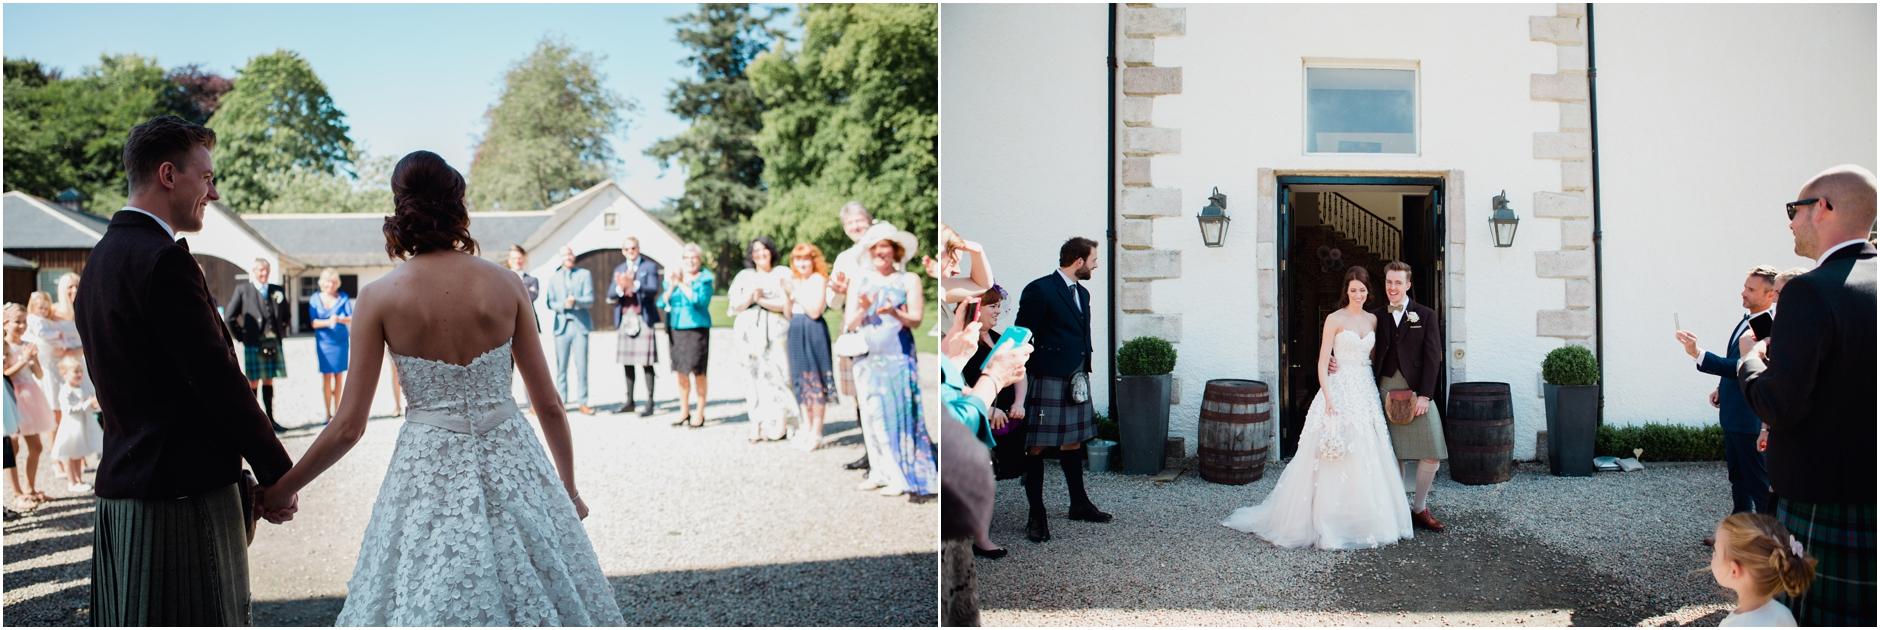 ntry house wedding photographer aberdeen highlandsntry house wedding photographer aberdeen highlands